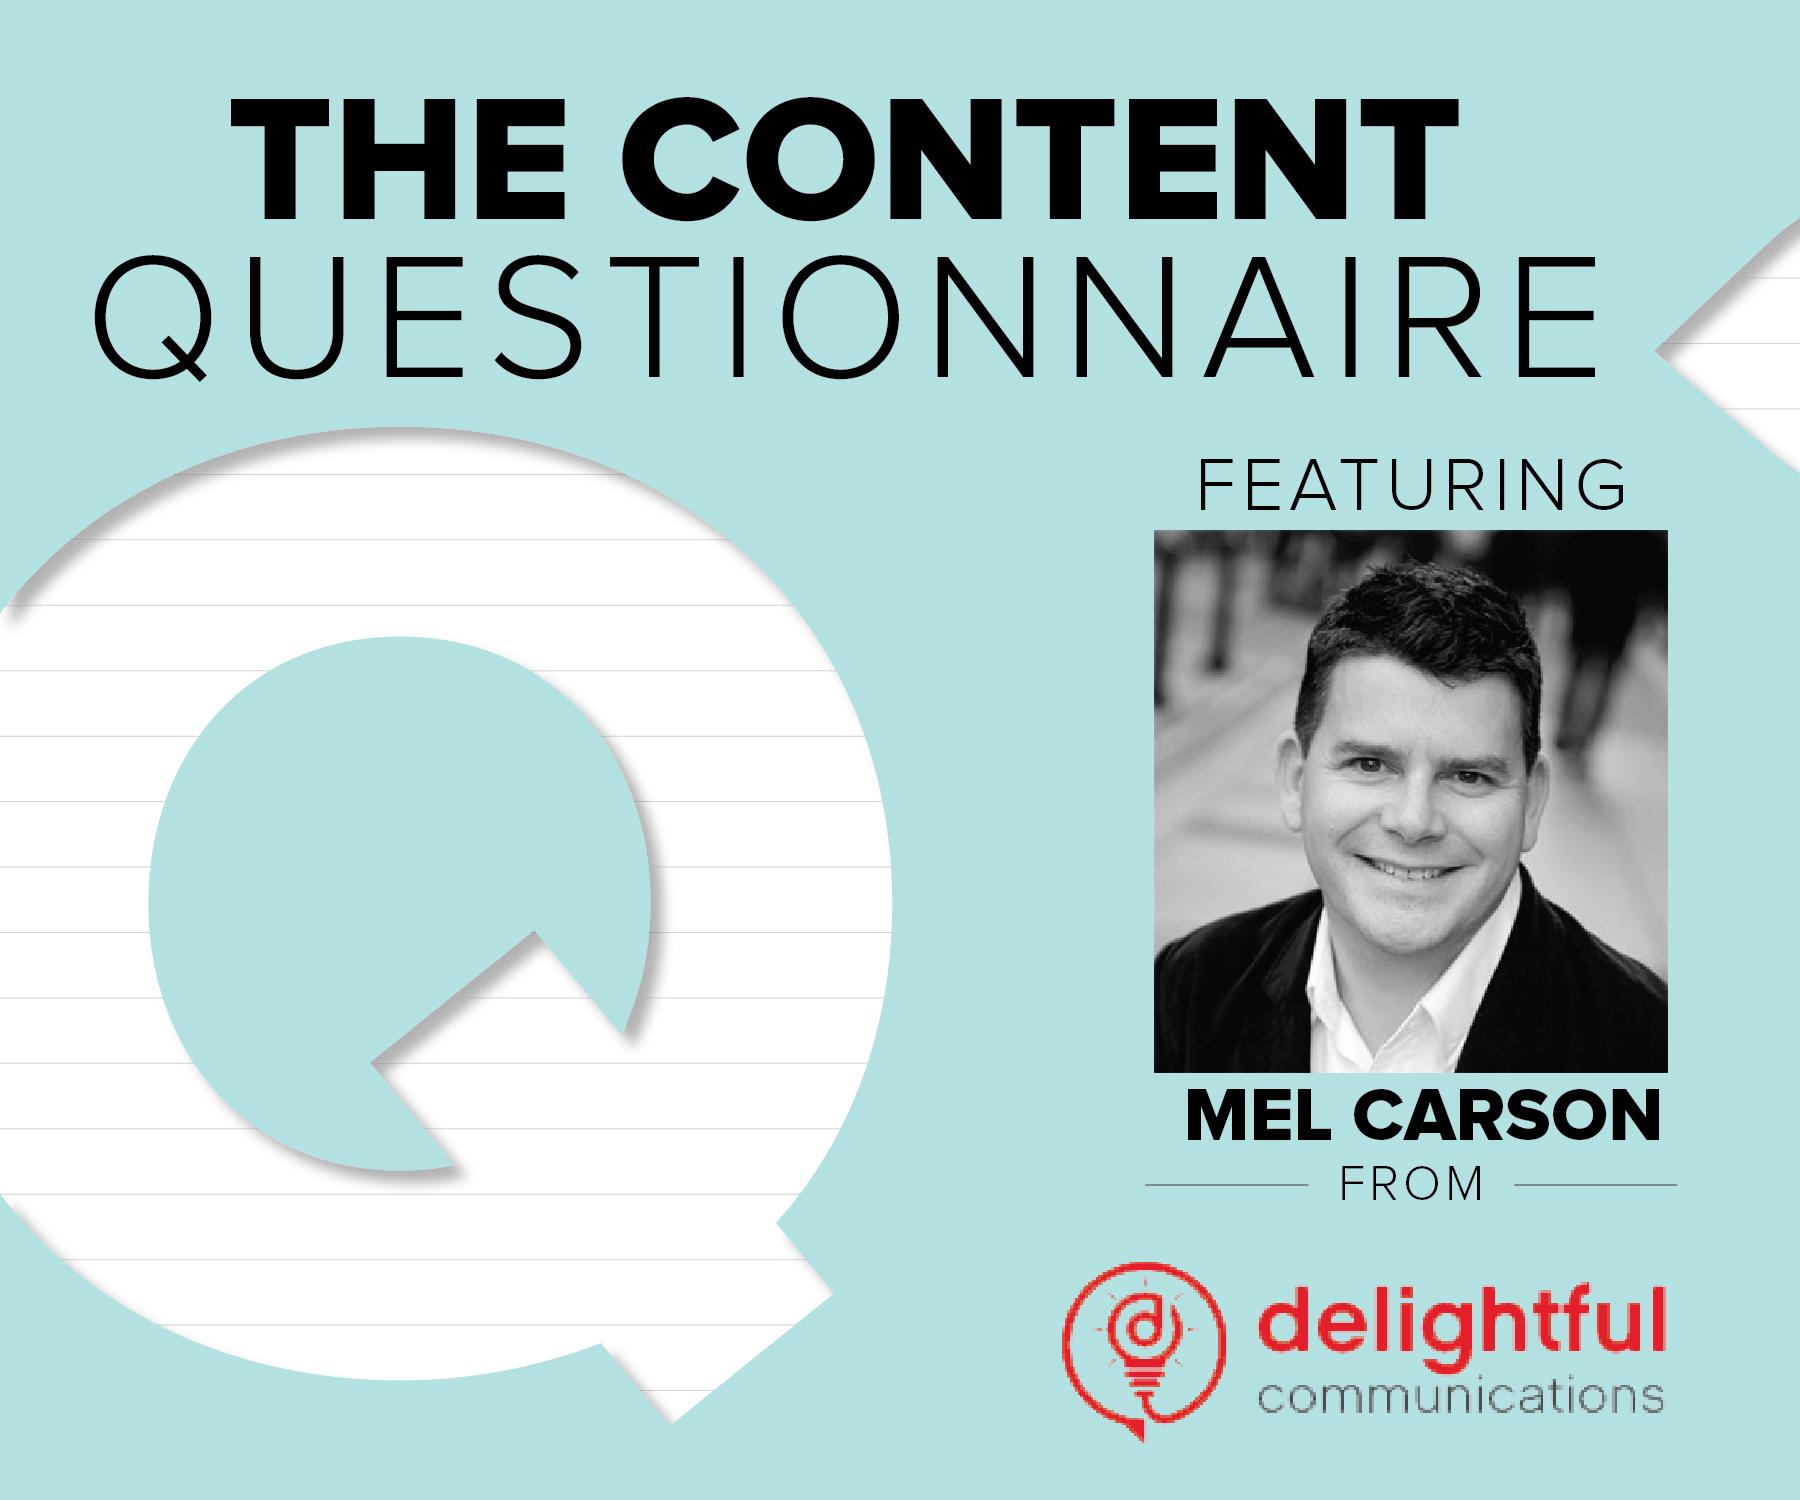 Mel Carson answers Brafton's Content Questionnaire.